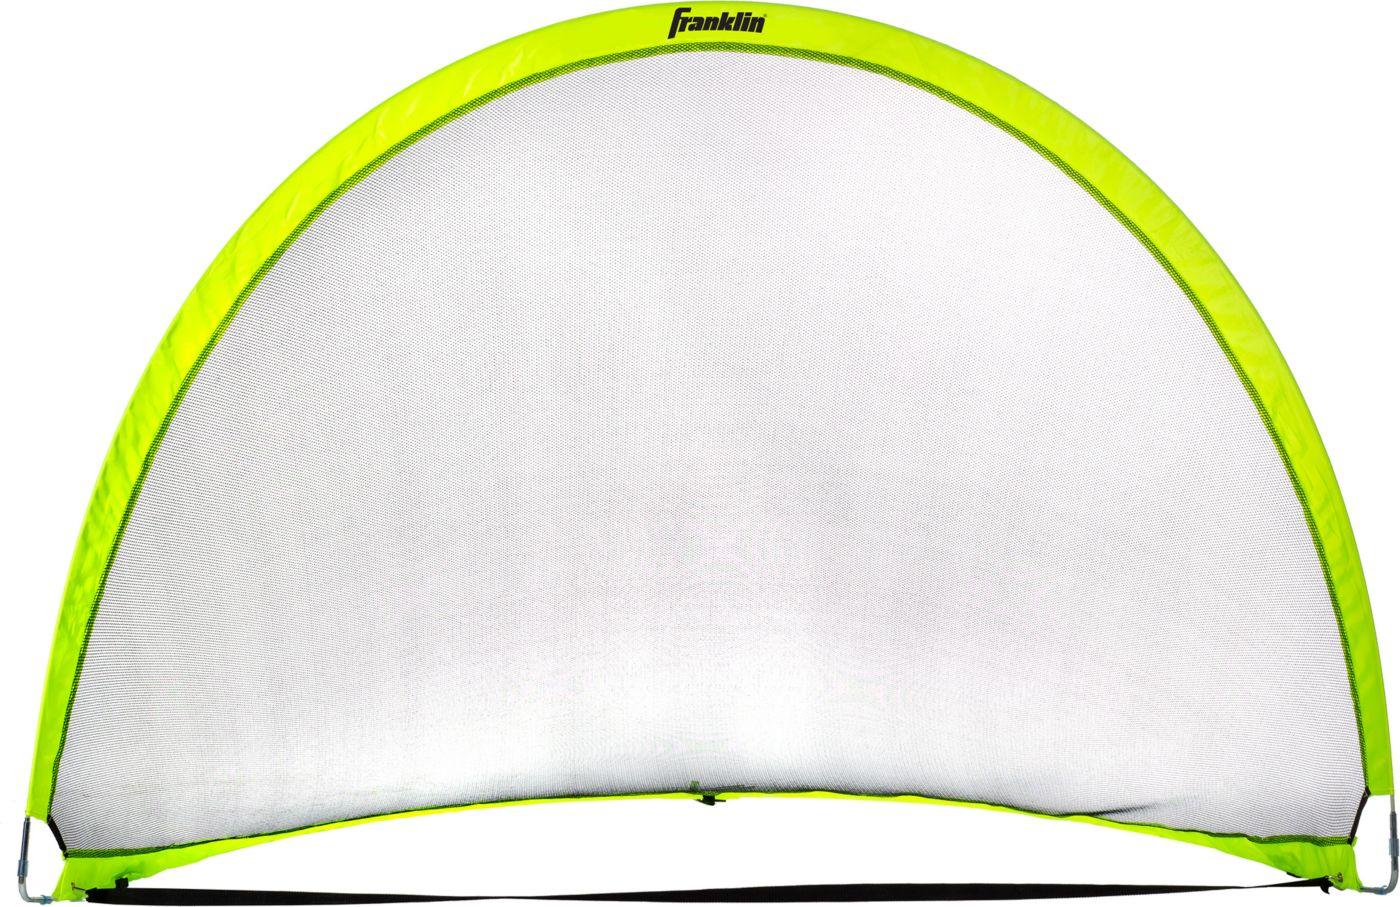 Franklin 2.5' x 2.5' Pop-Up Soccer Goal